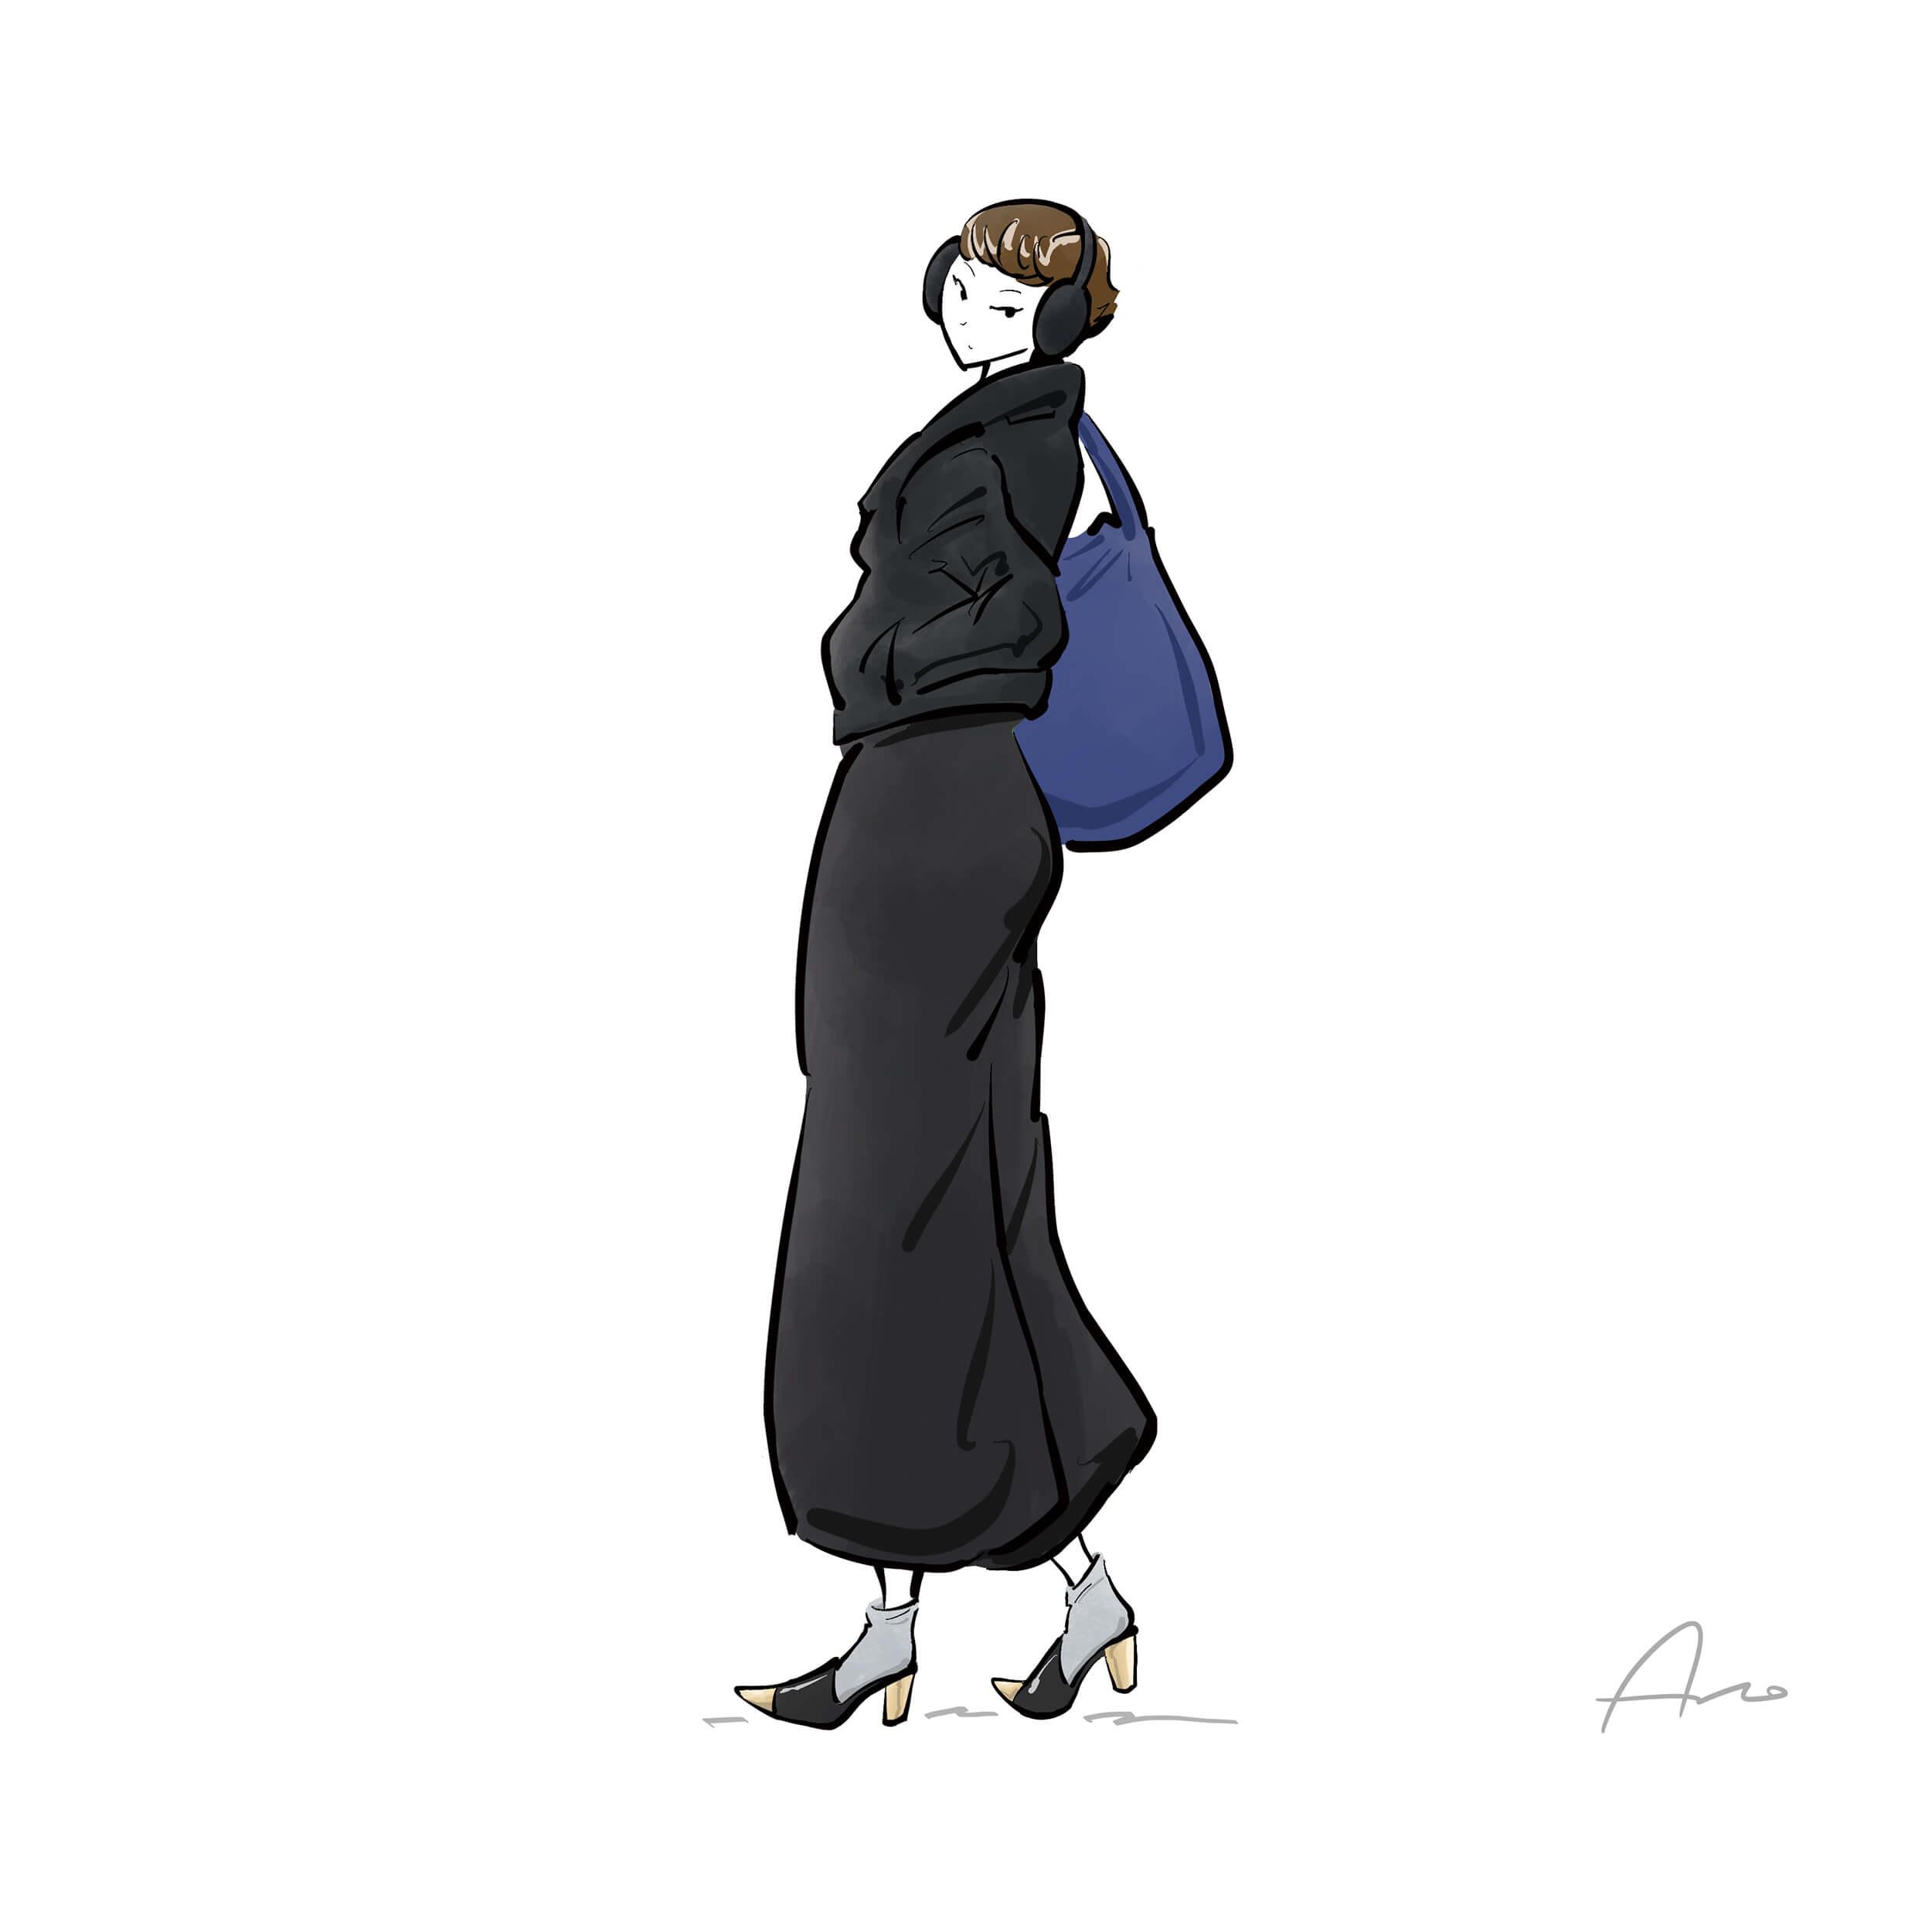 2017 05 01